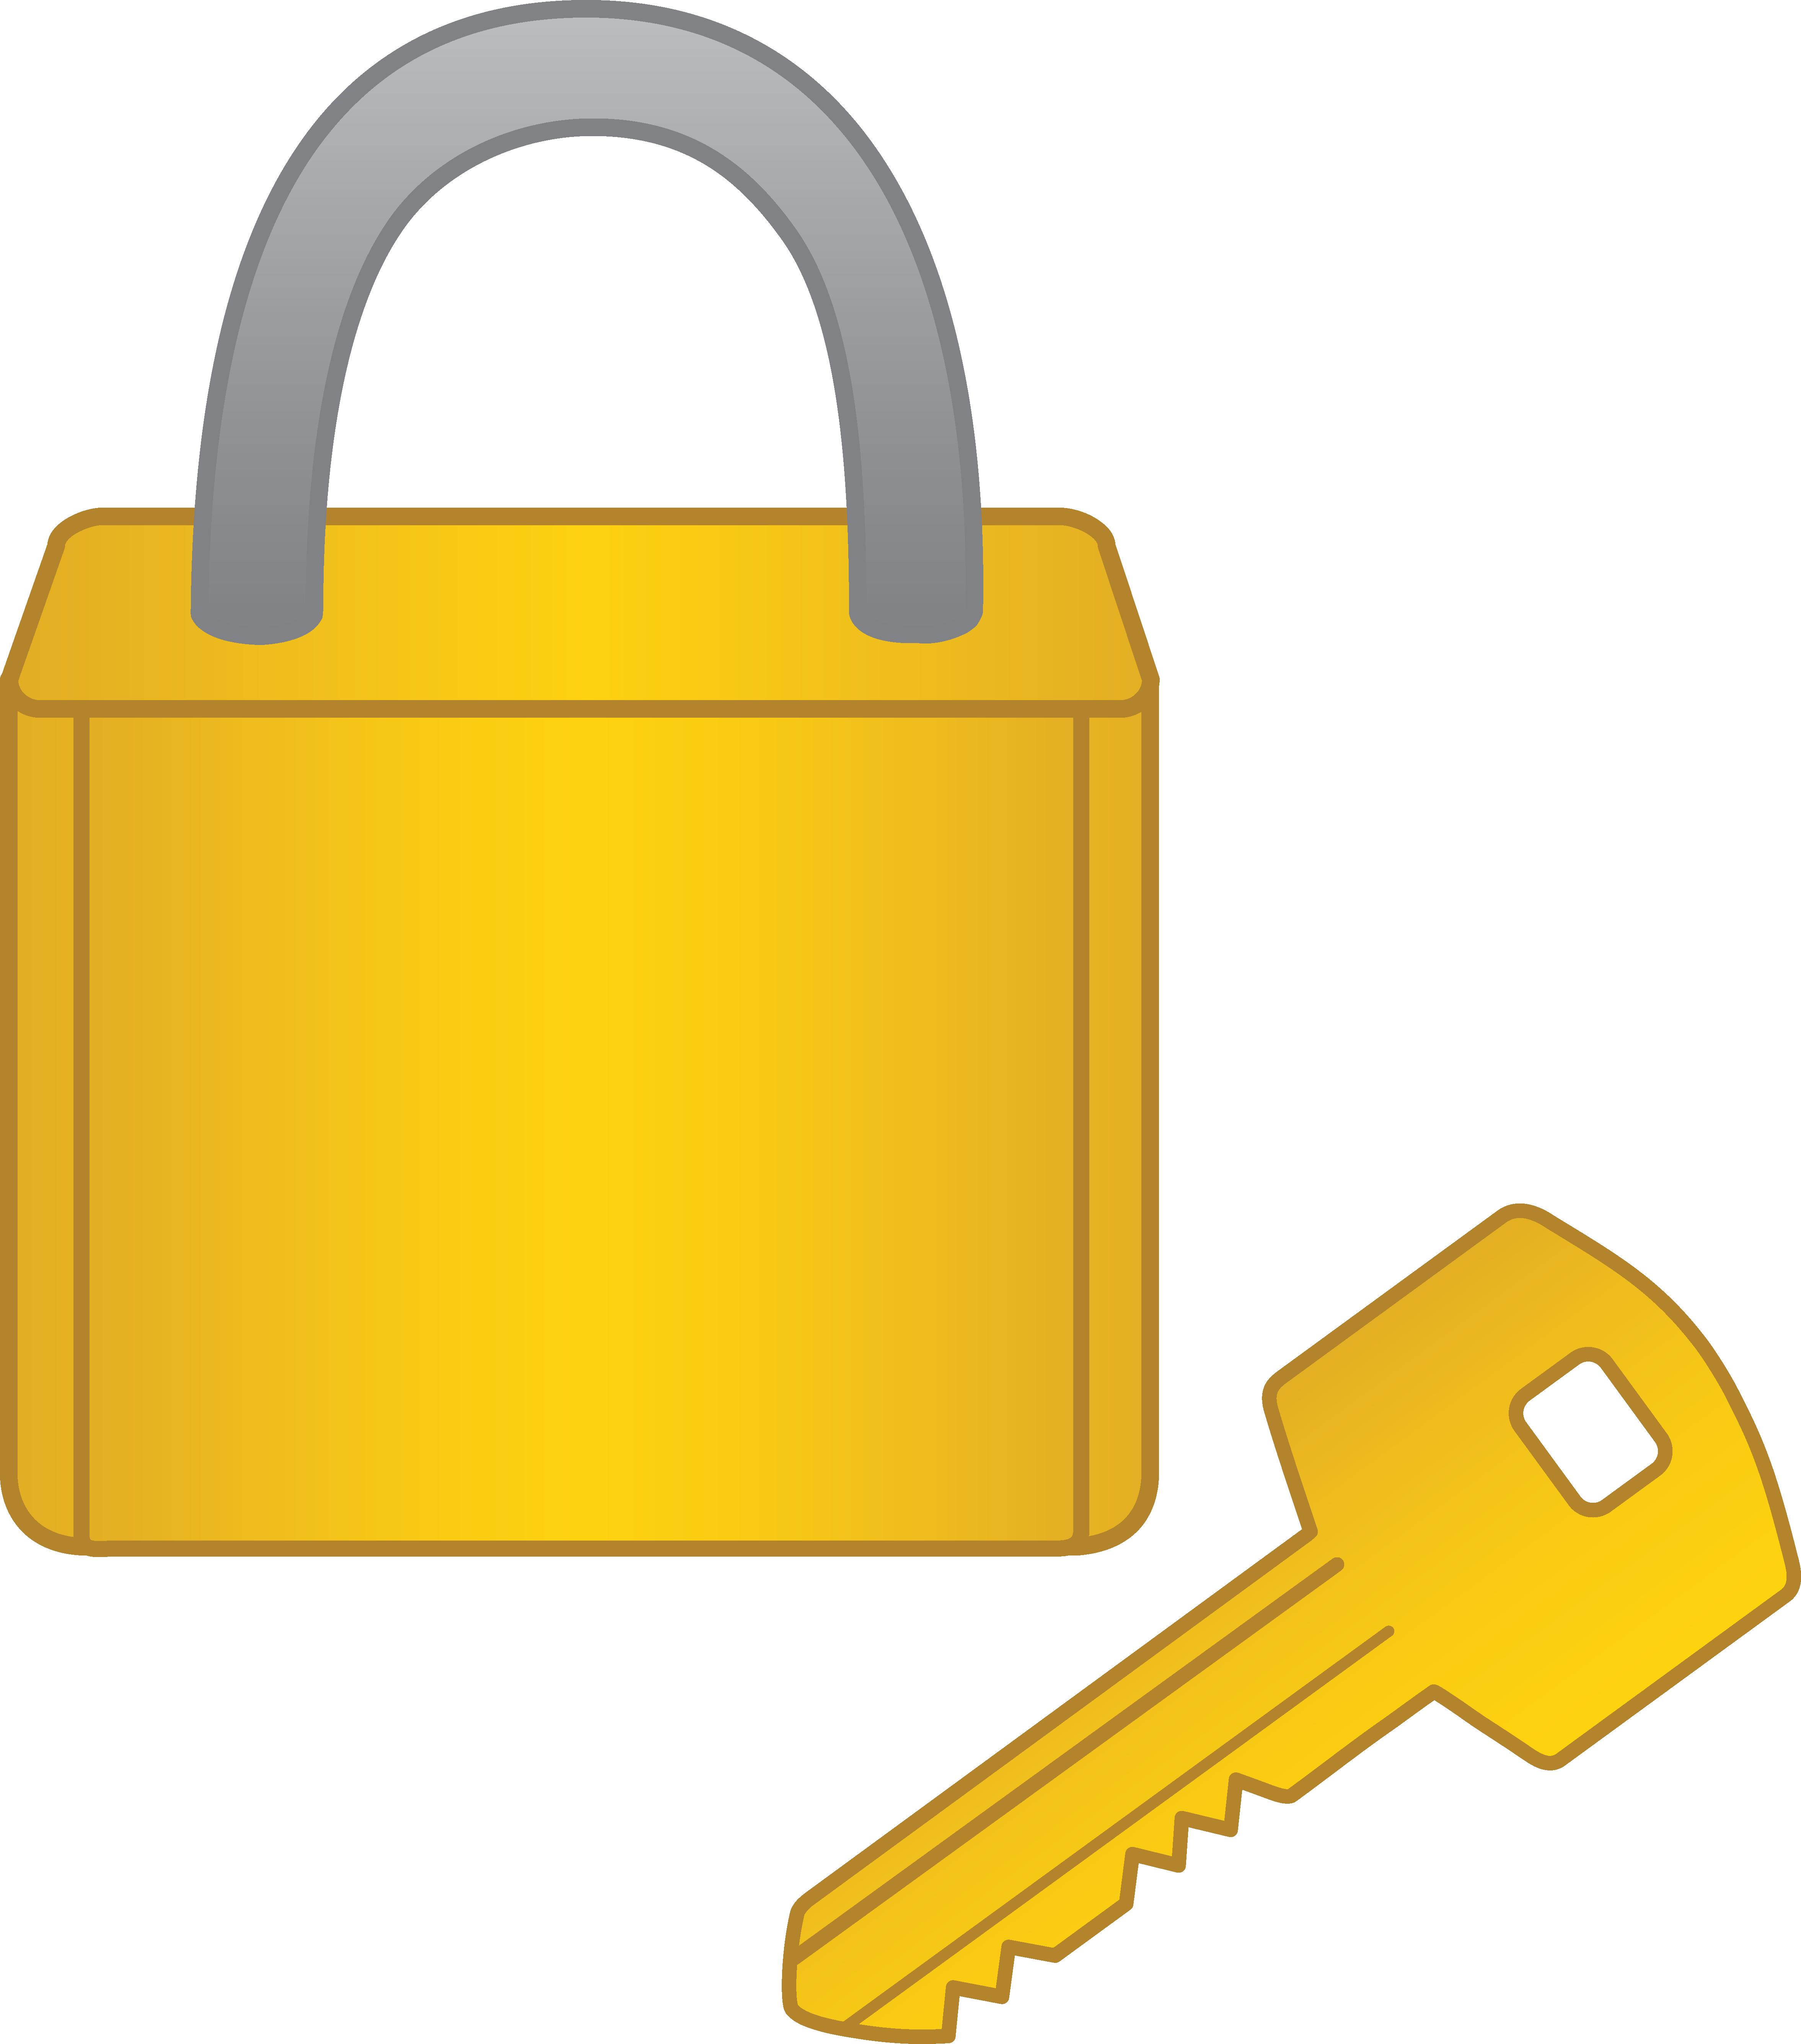 PNG Keys And Locks - 50448